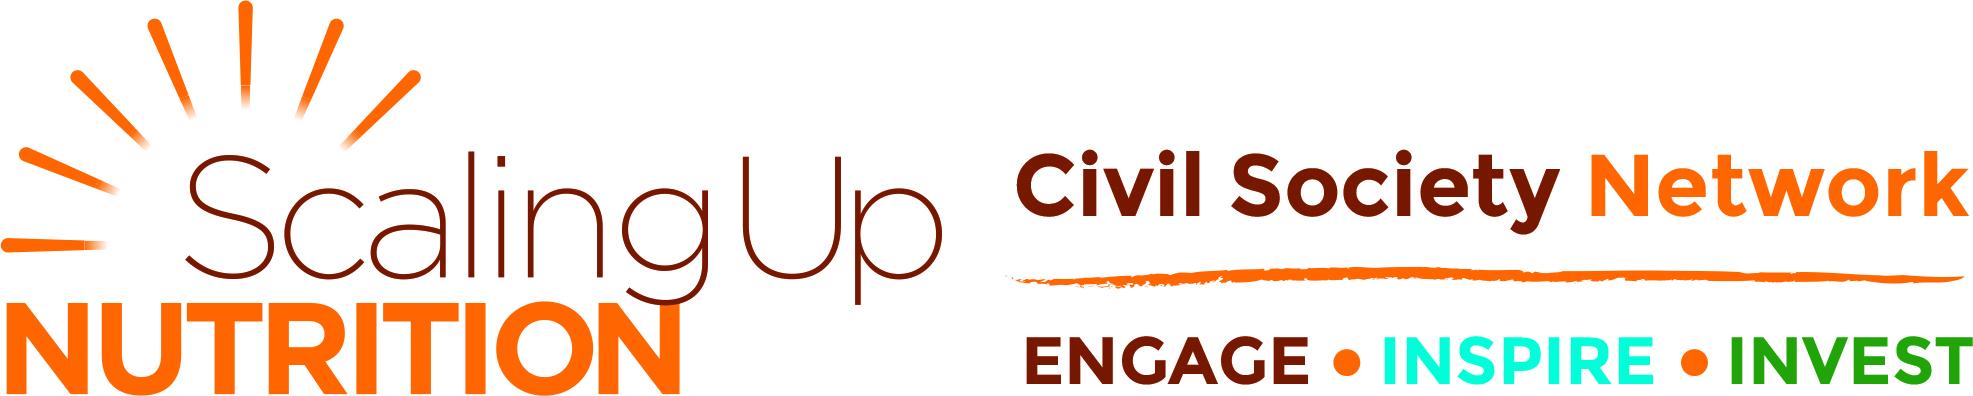 logo_civil_society_network_CMYK_ENG